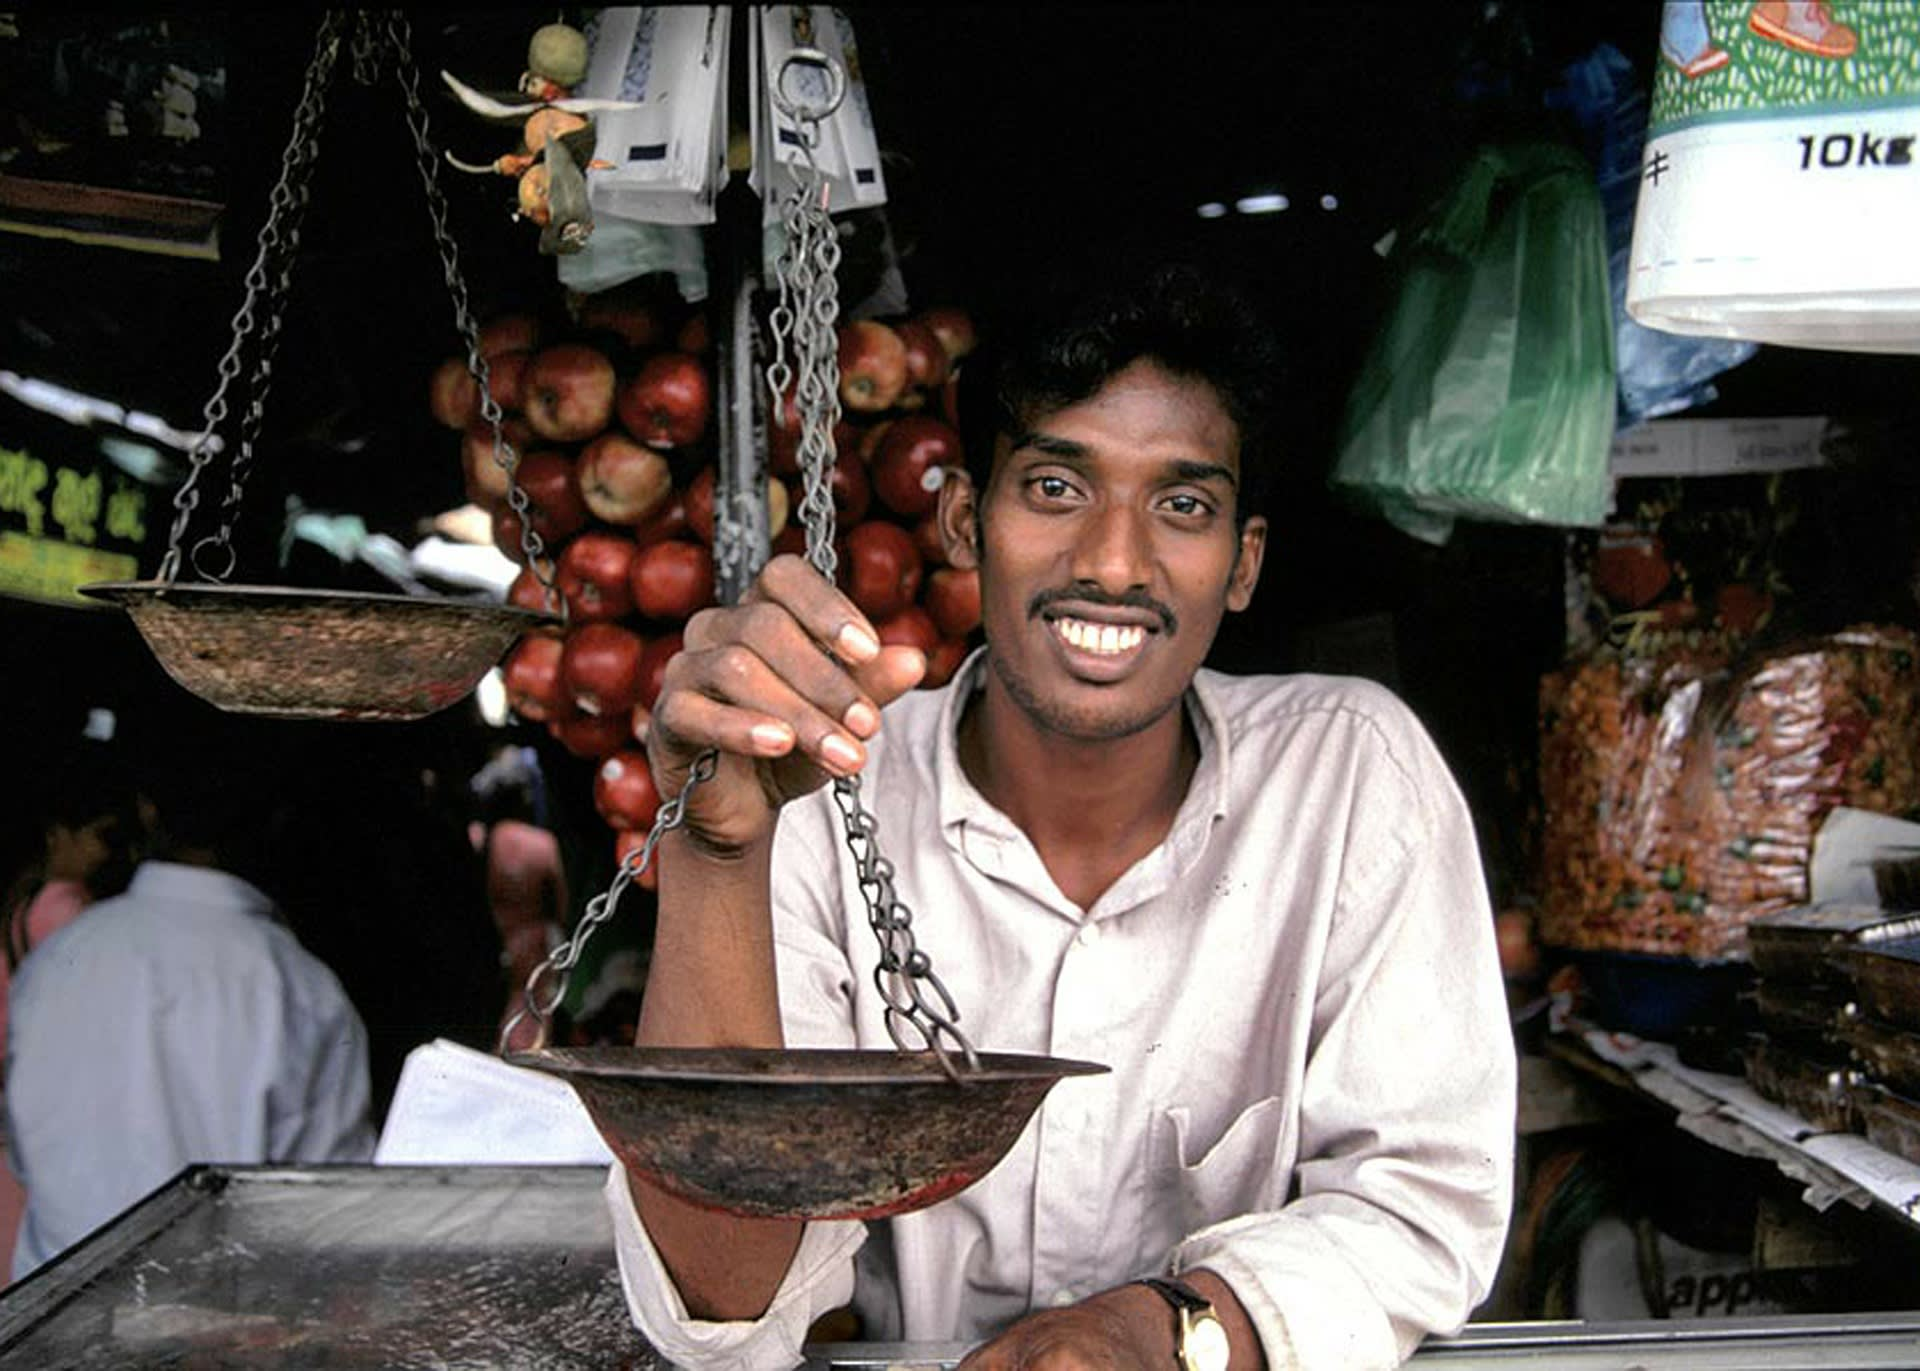 Verkäufer an einem Marktstand in Sri Lanka